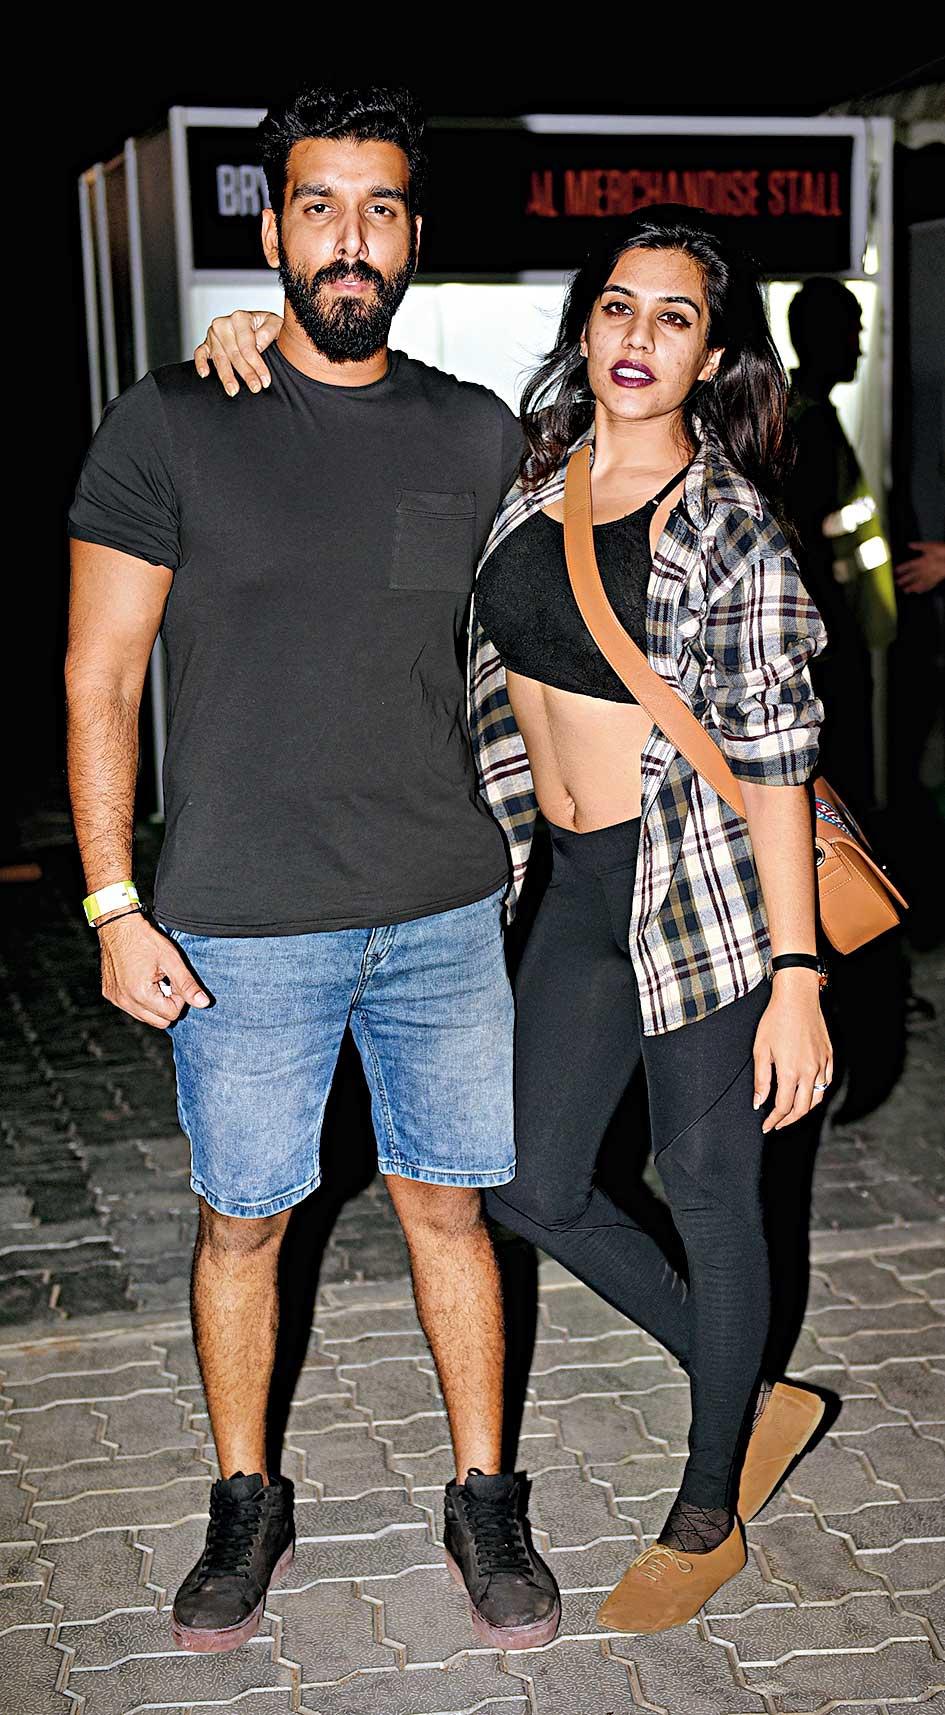 Bryan Adams: When Bryan Adams gave Hyderabadis a night to